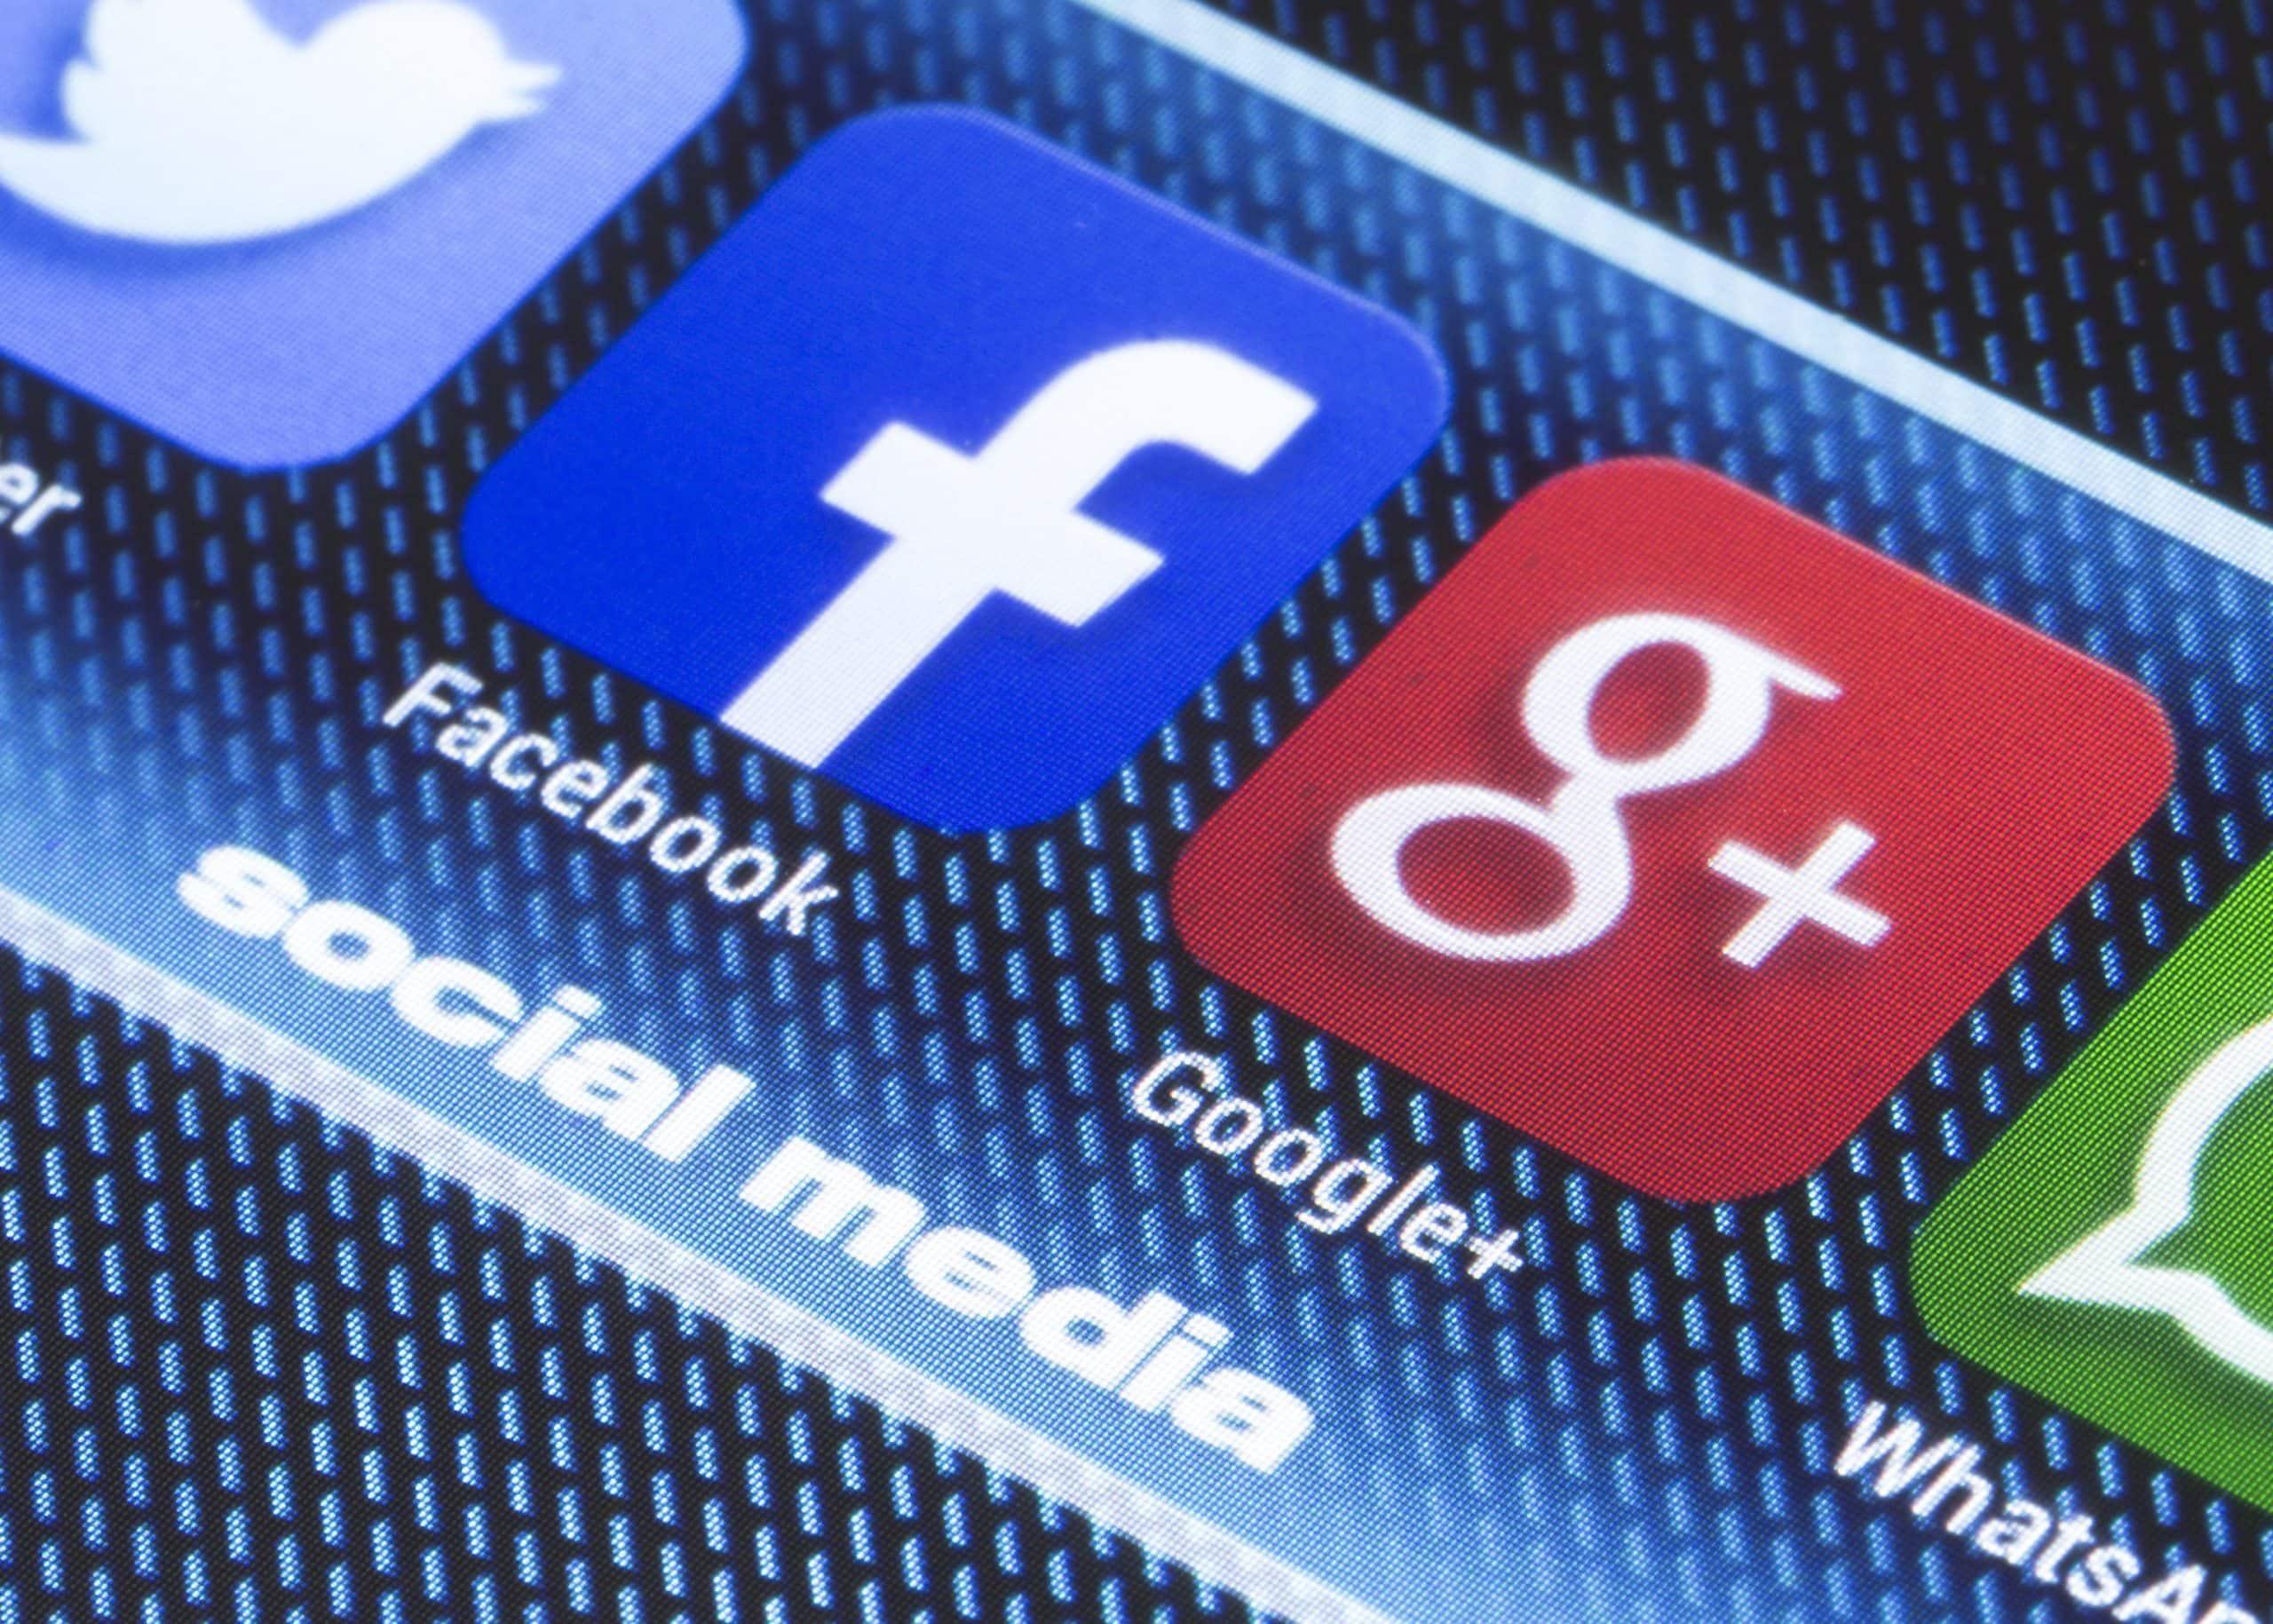 How Fractal wants to break the internet oligopoly